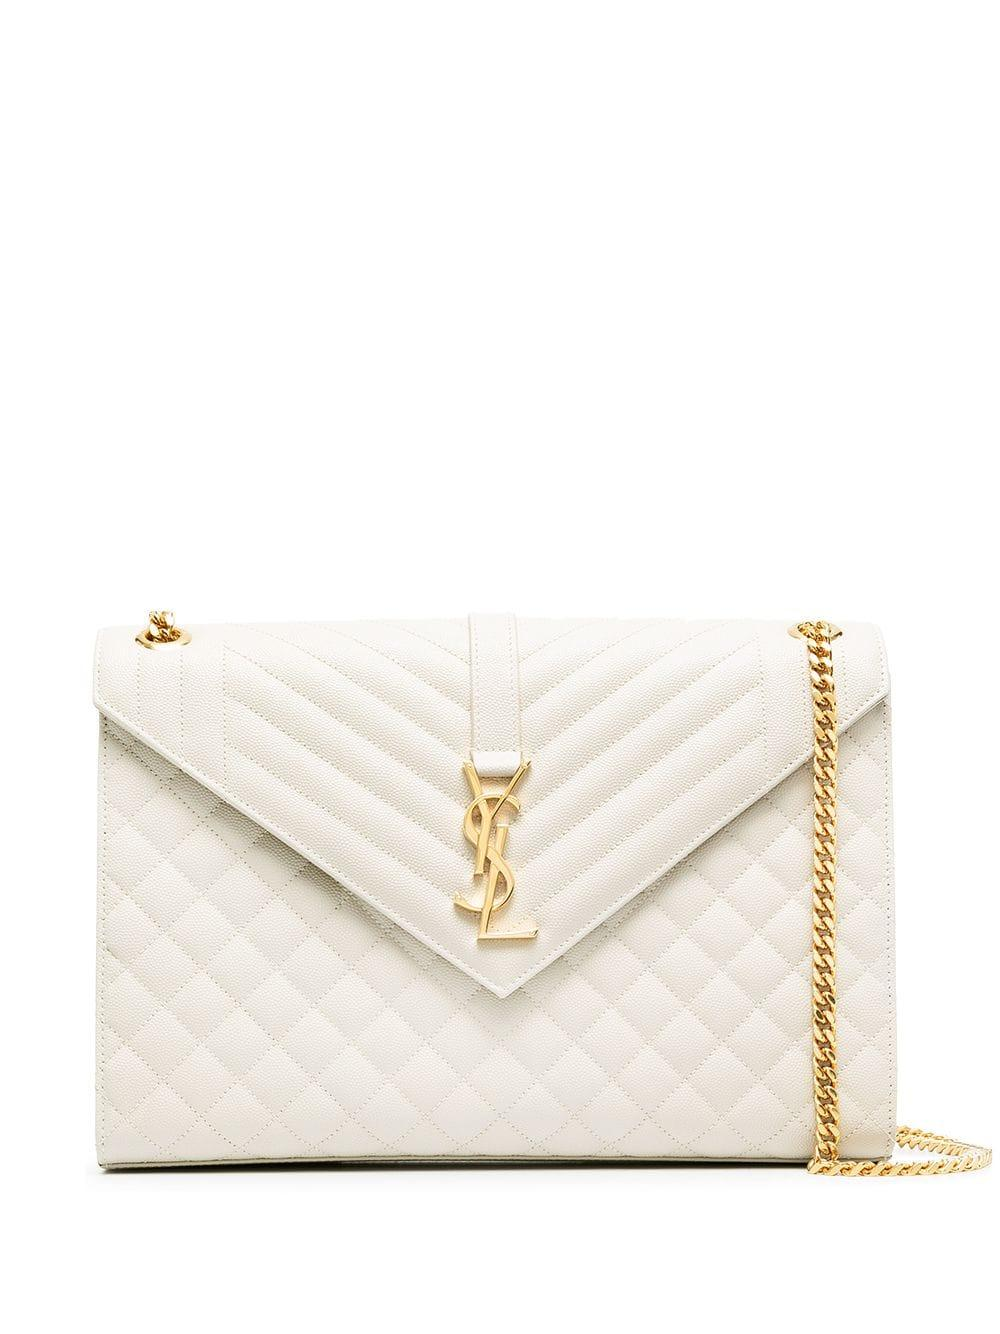 Envelope Chain Bag Item # 5327500SX0W